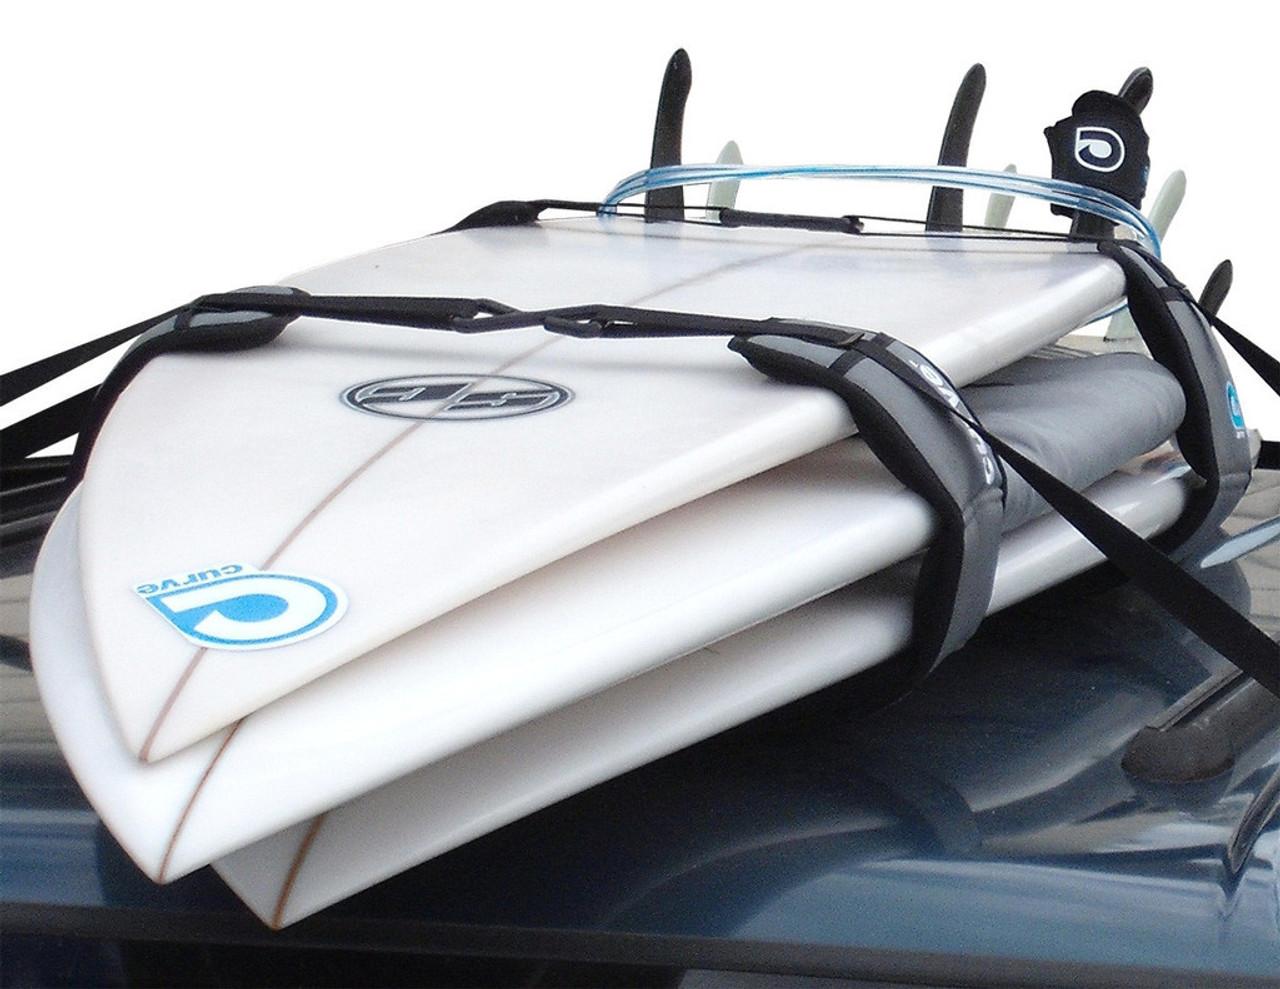 Surf Roof Racks Universal Surfboard Car Rack